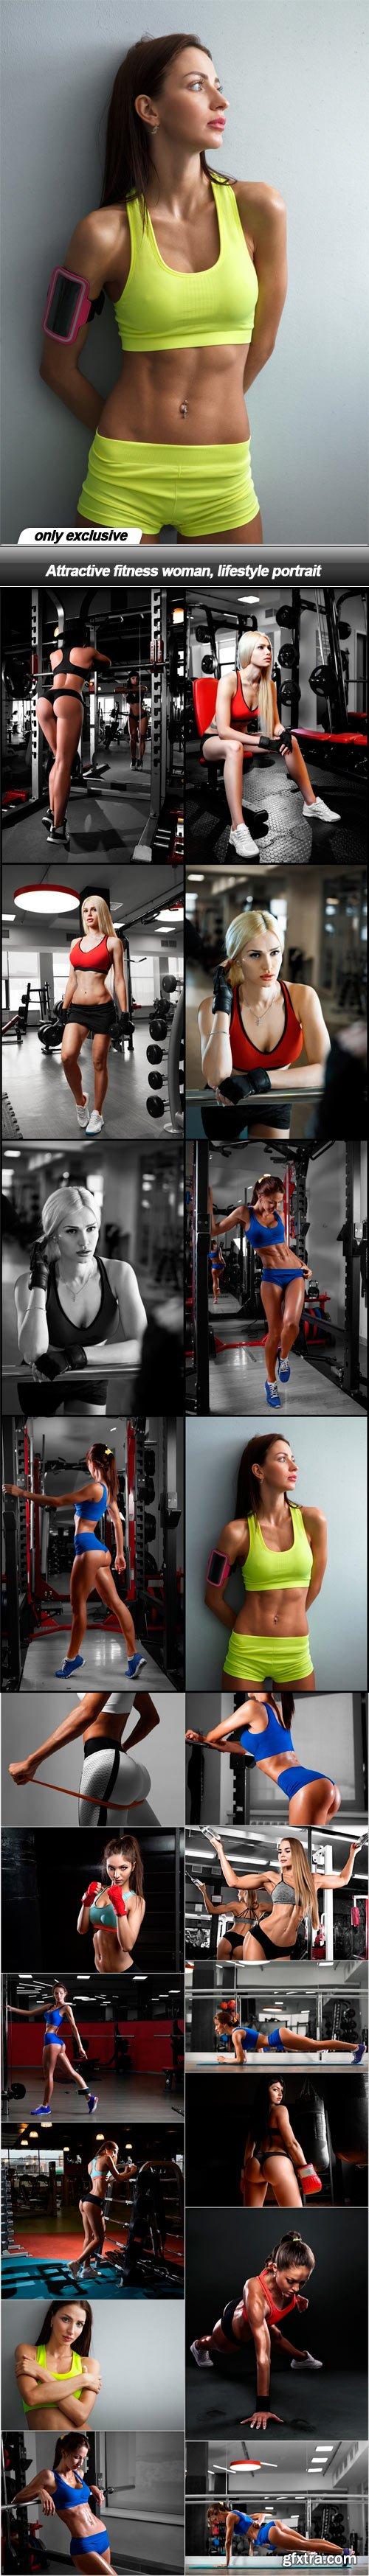 Attractive fitness woman, lifestyle portrait - 20 UHQ JPEG